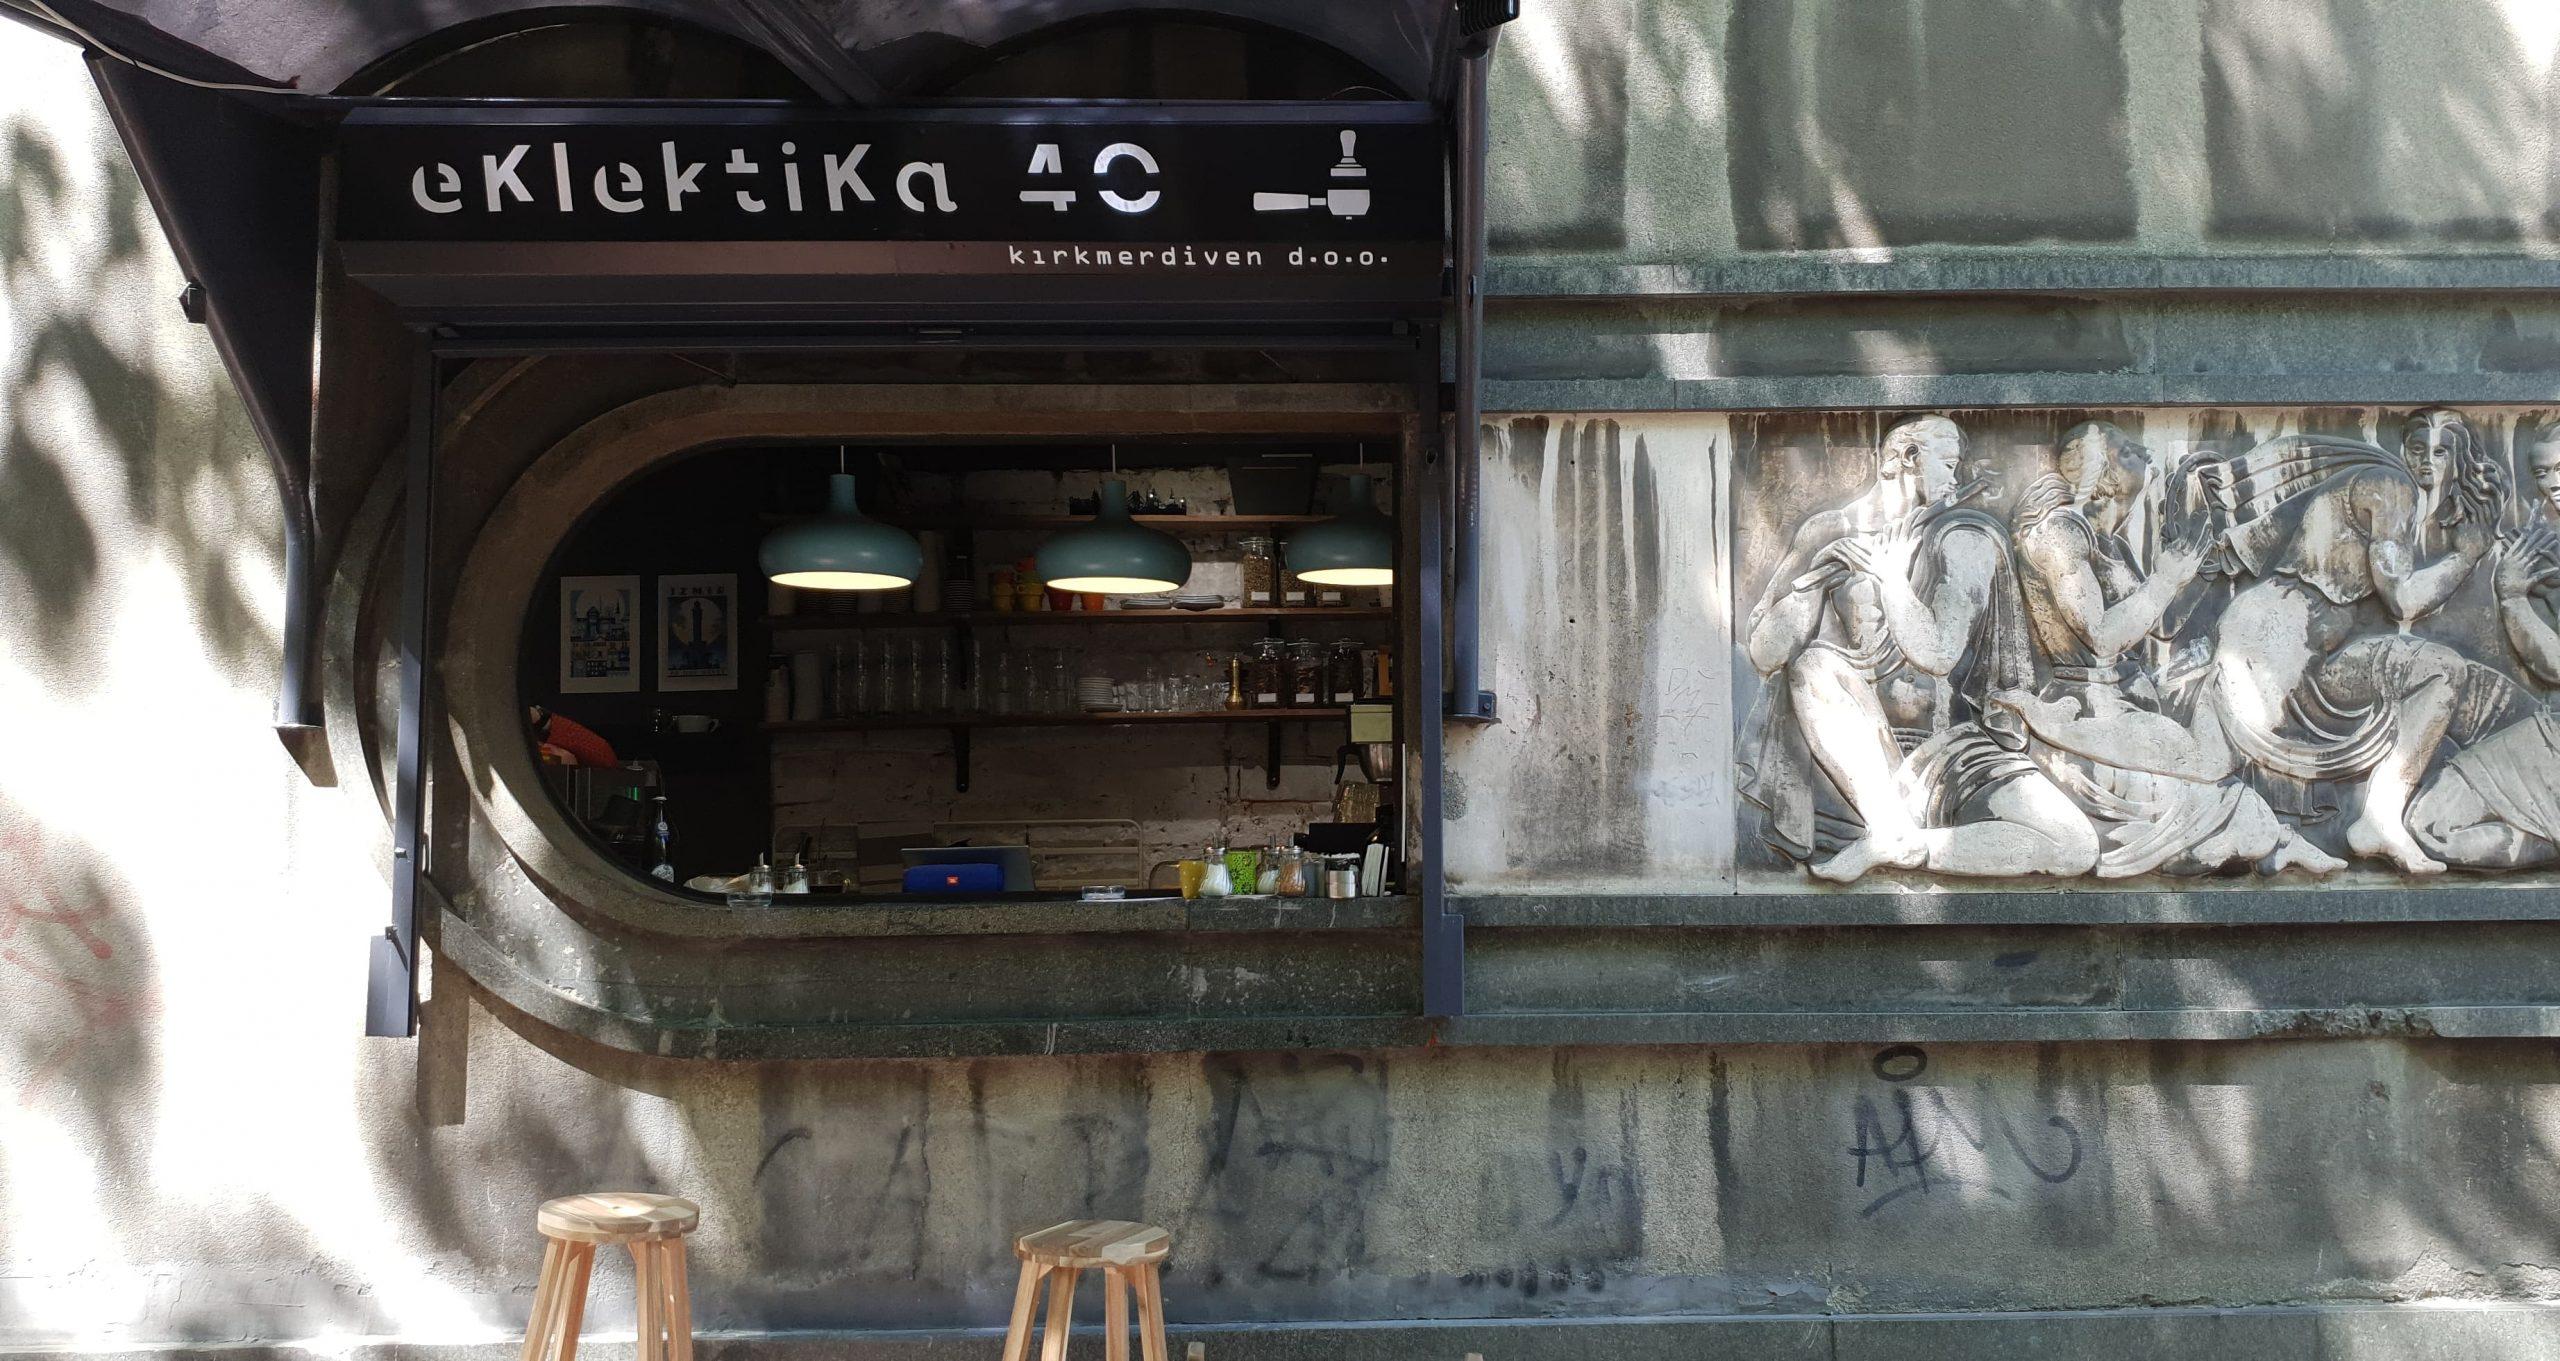 eklektika 40 coffee shop in Belgrade